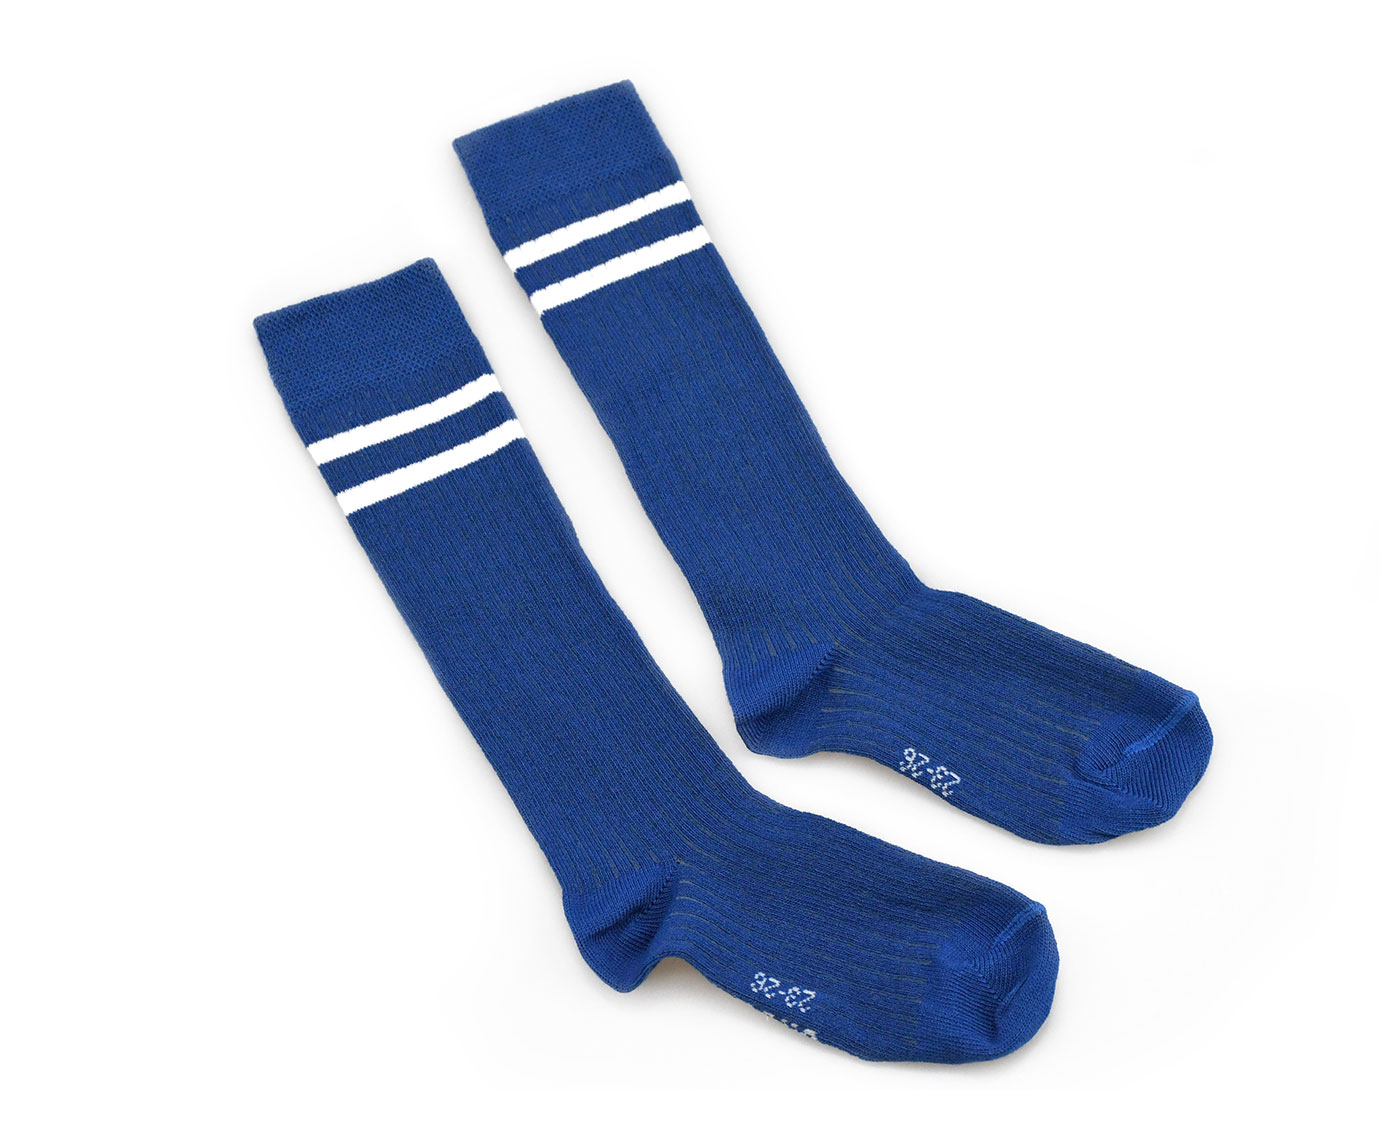 Kniekousen 'Sport Blauw' kleur